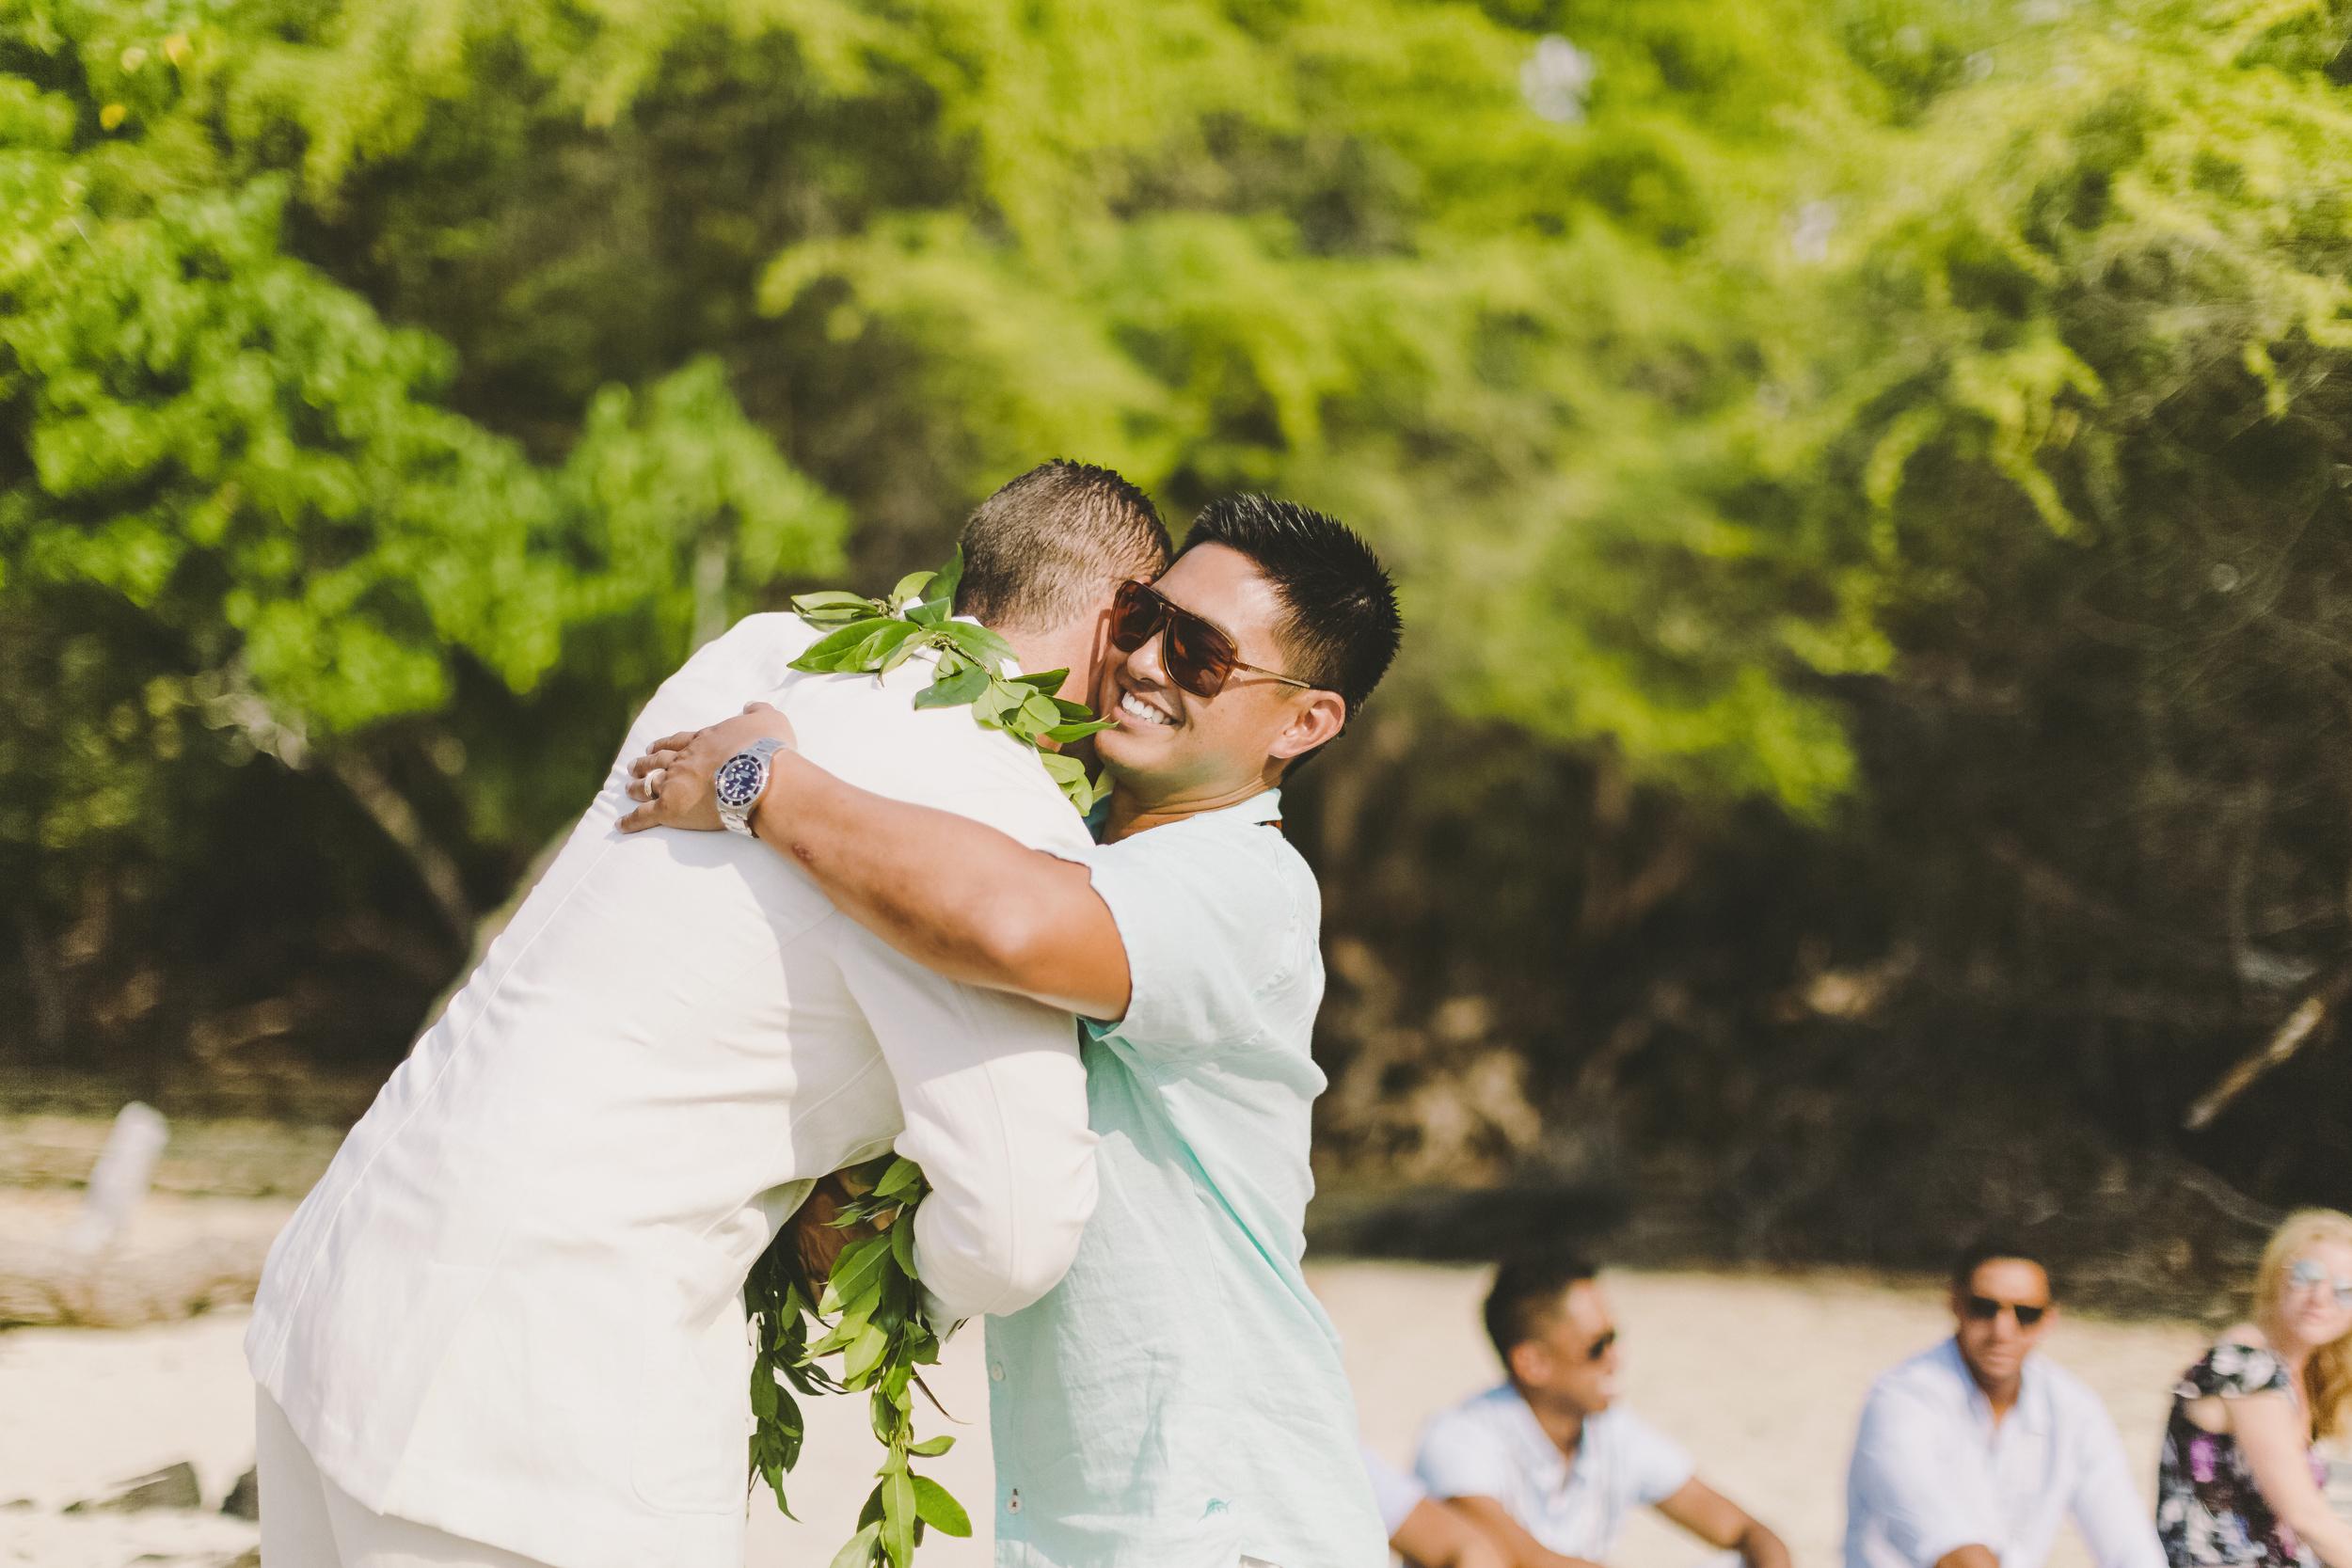 angie-diaz-photography-hawaii-wedding-photographer-kelli-jay-47.jpg